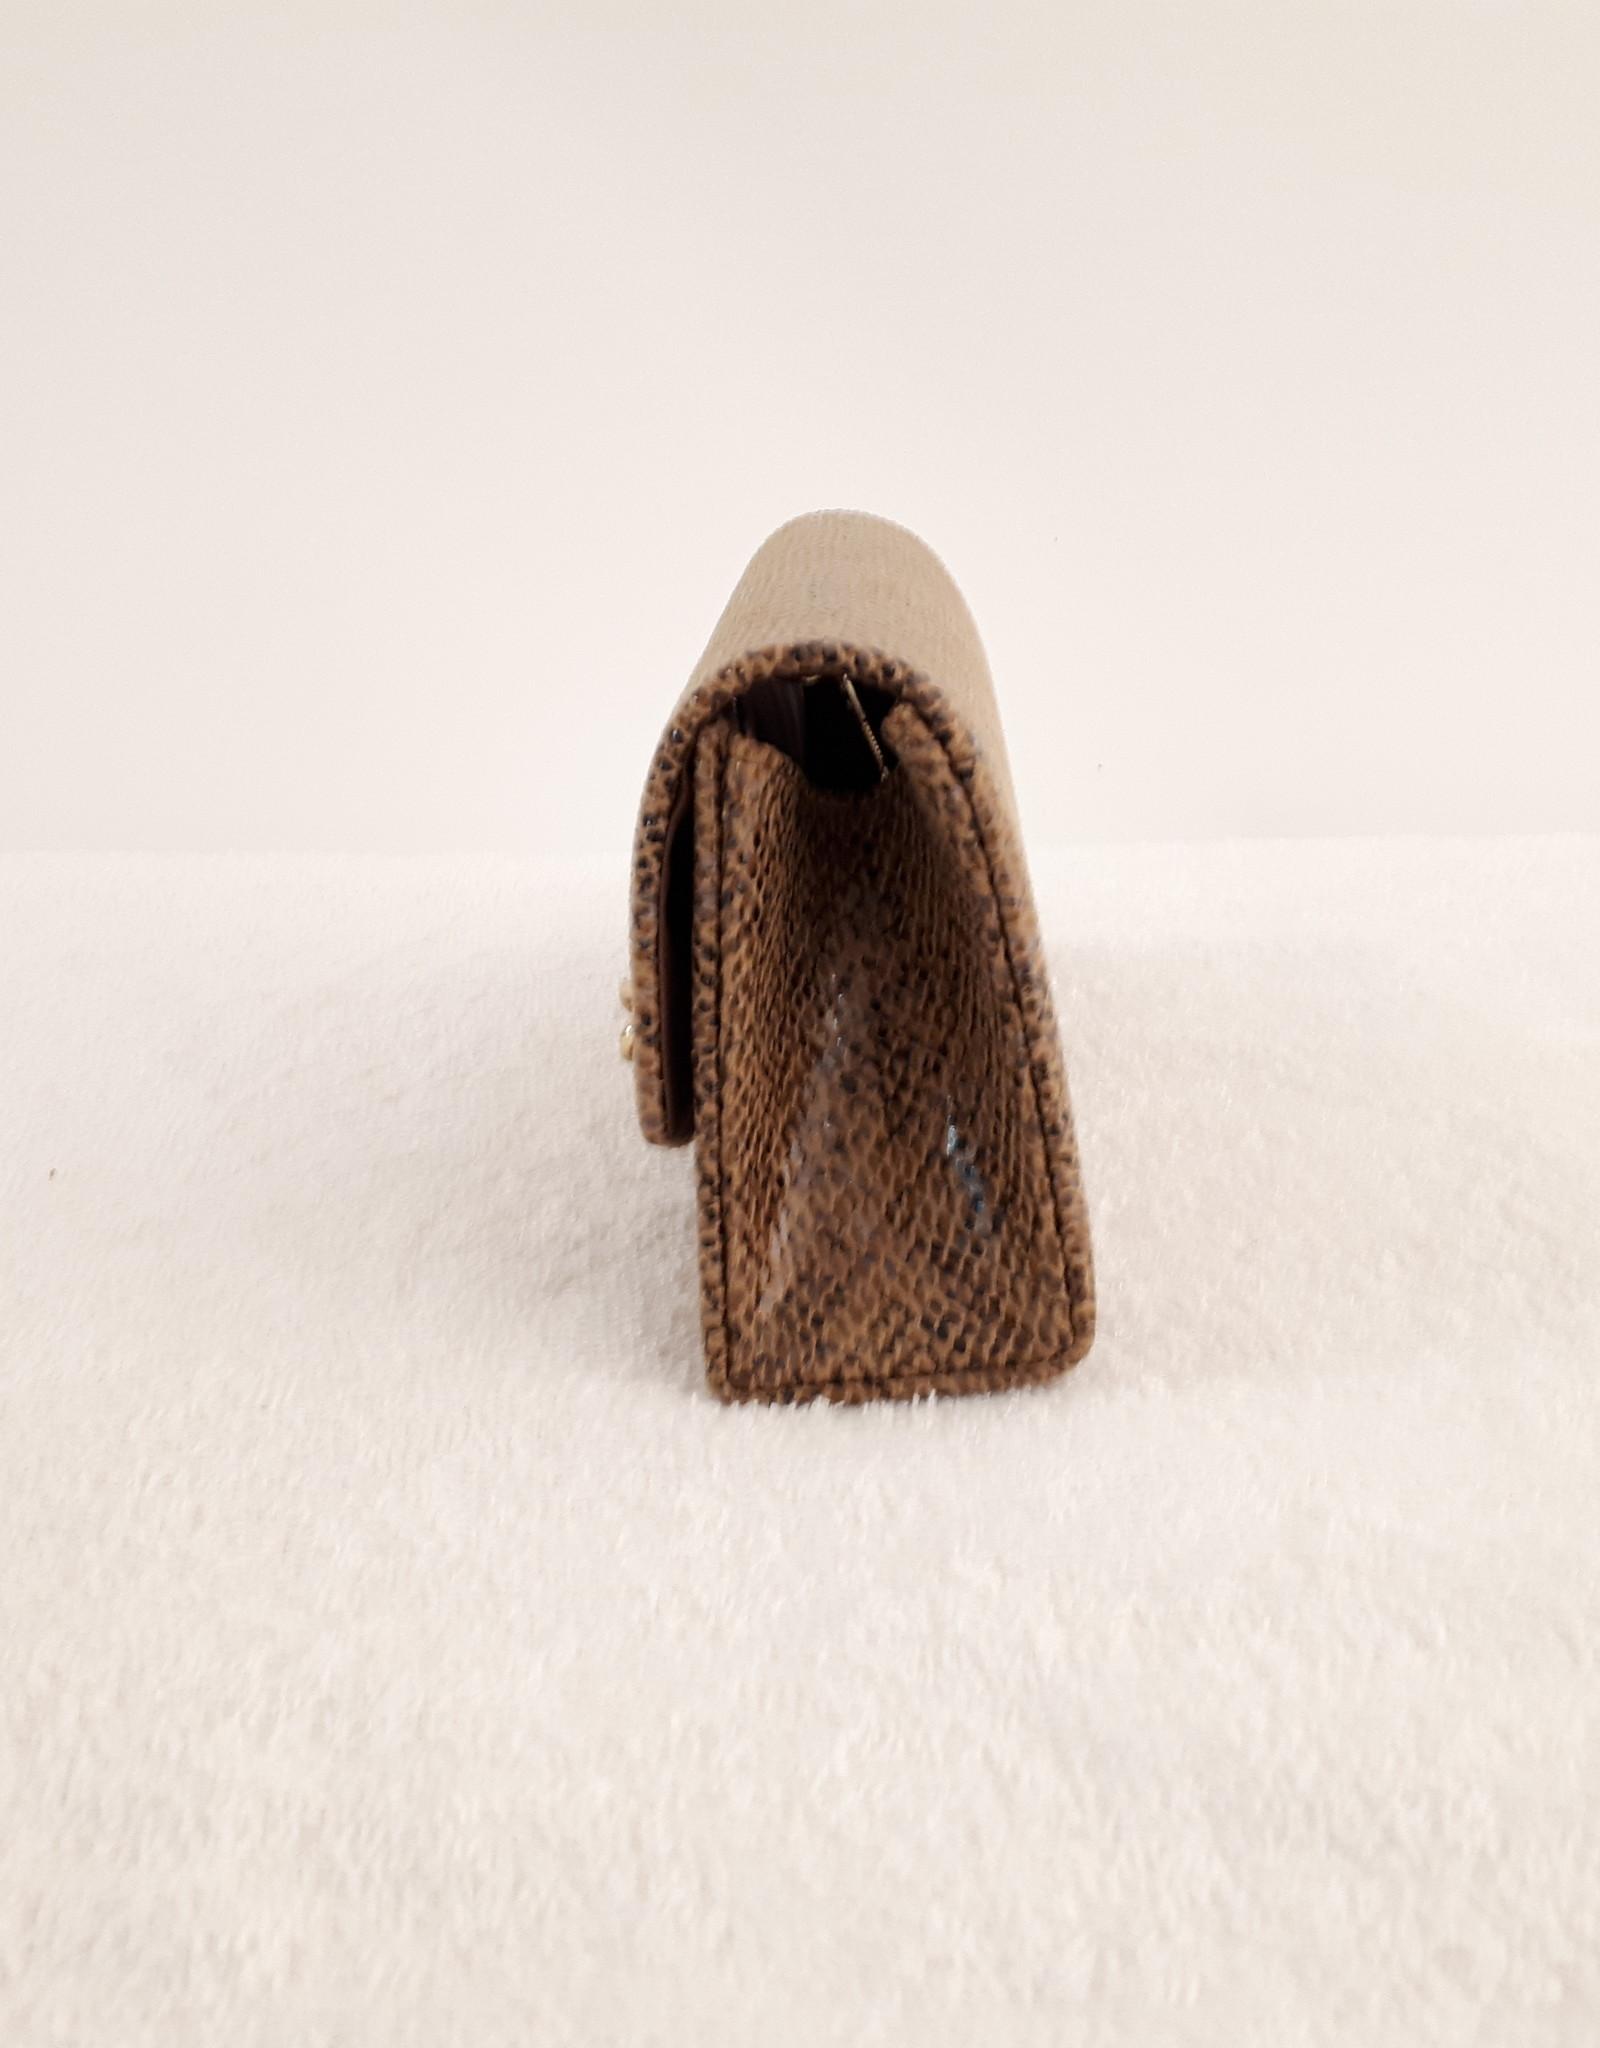 About accessories Tas Tijgerprint